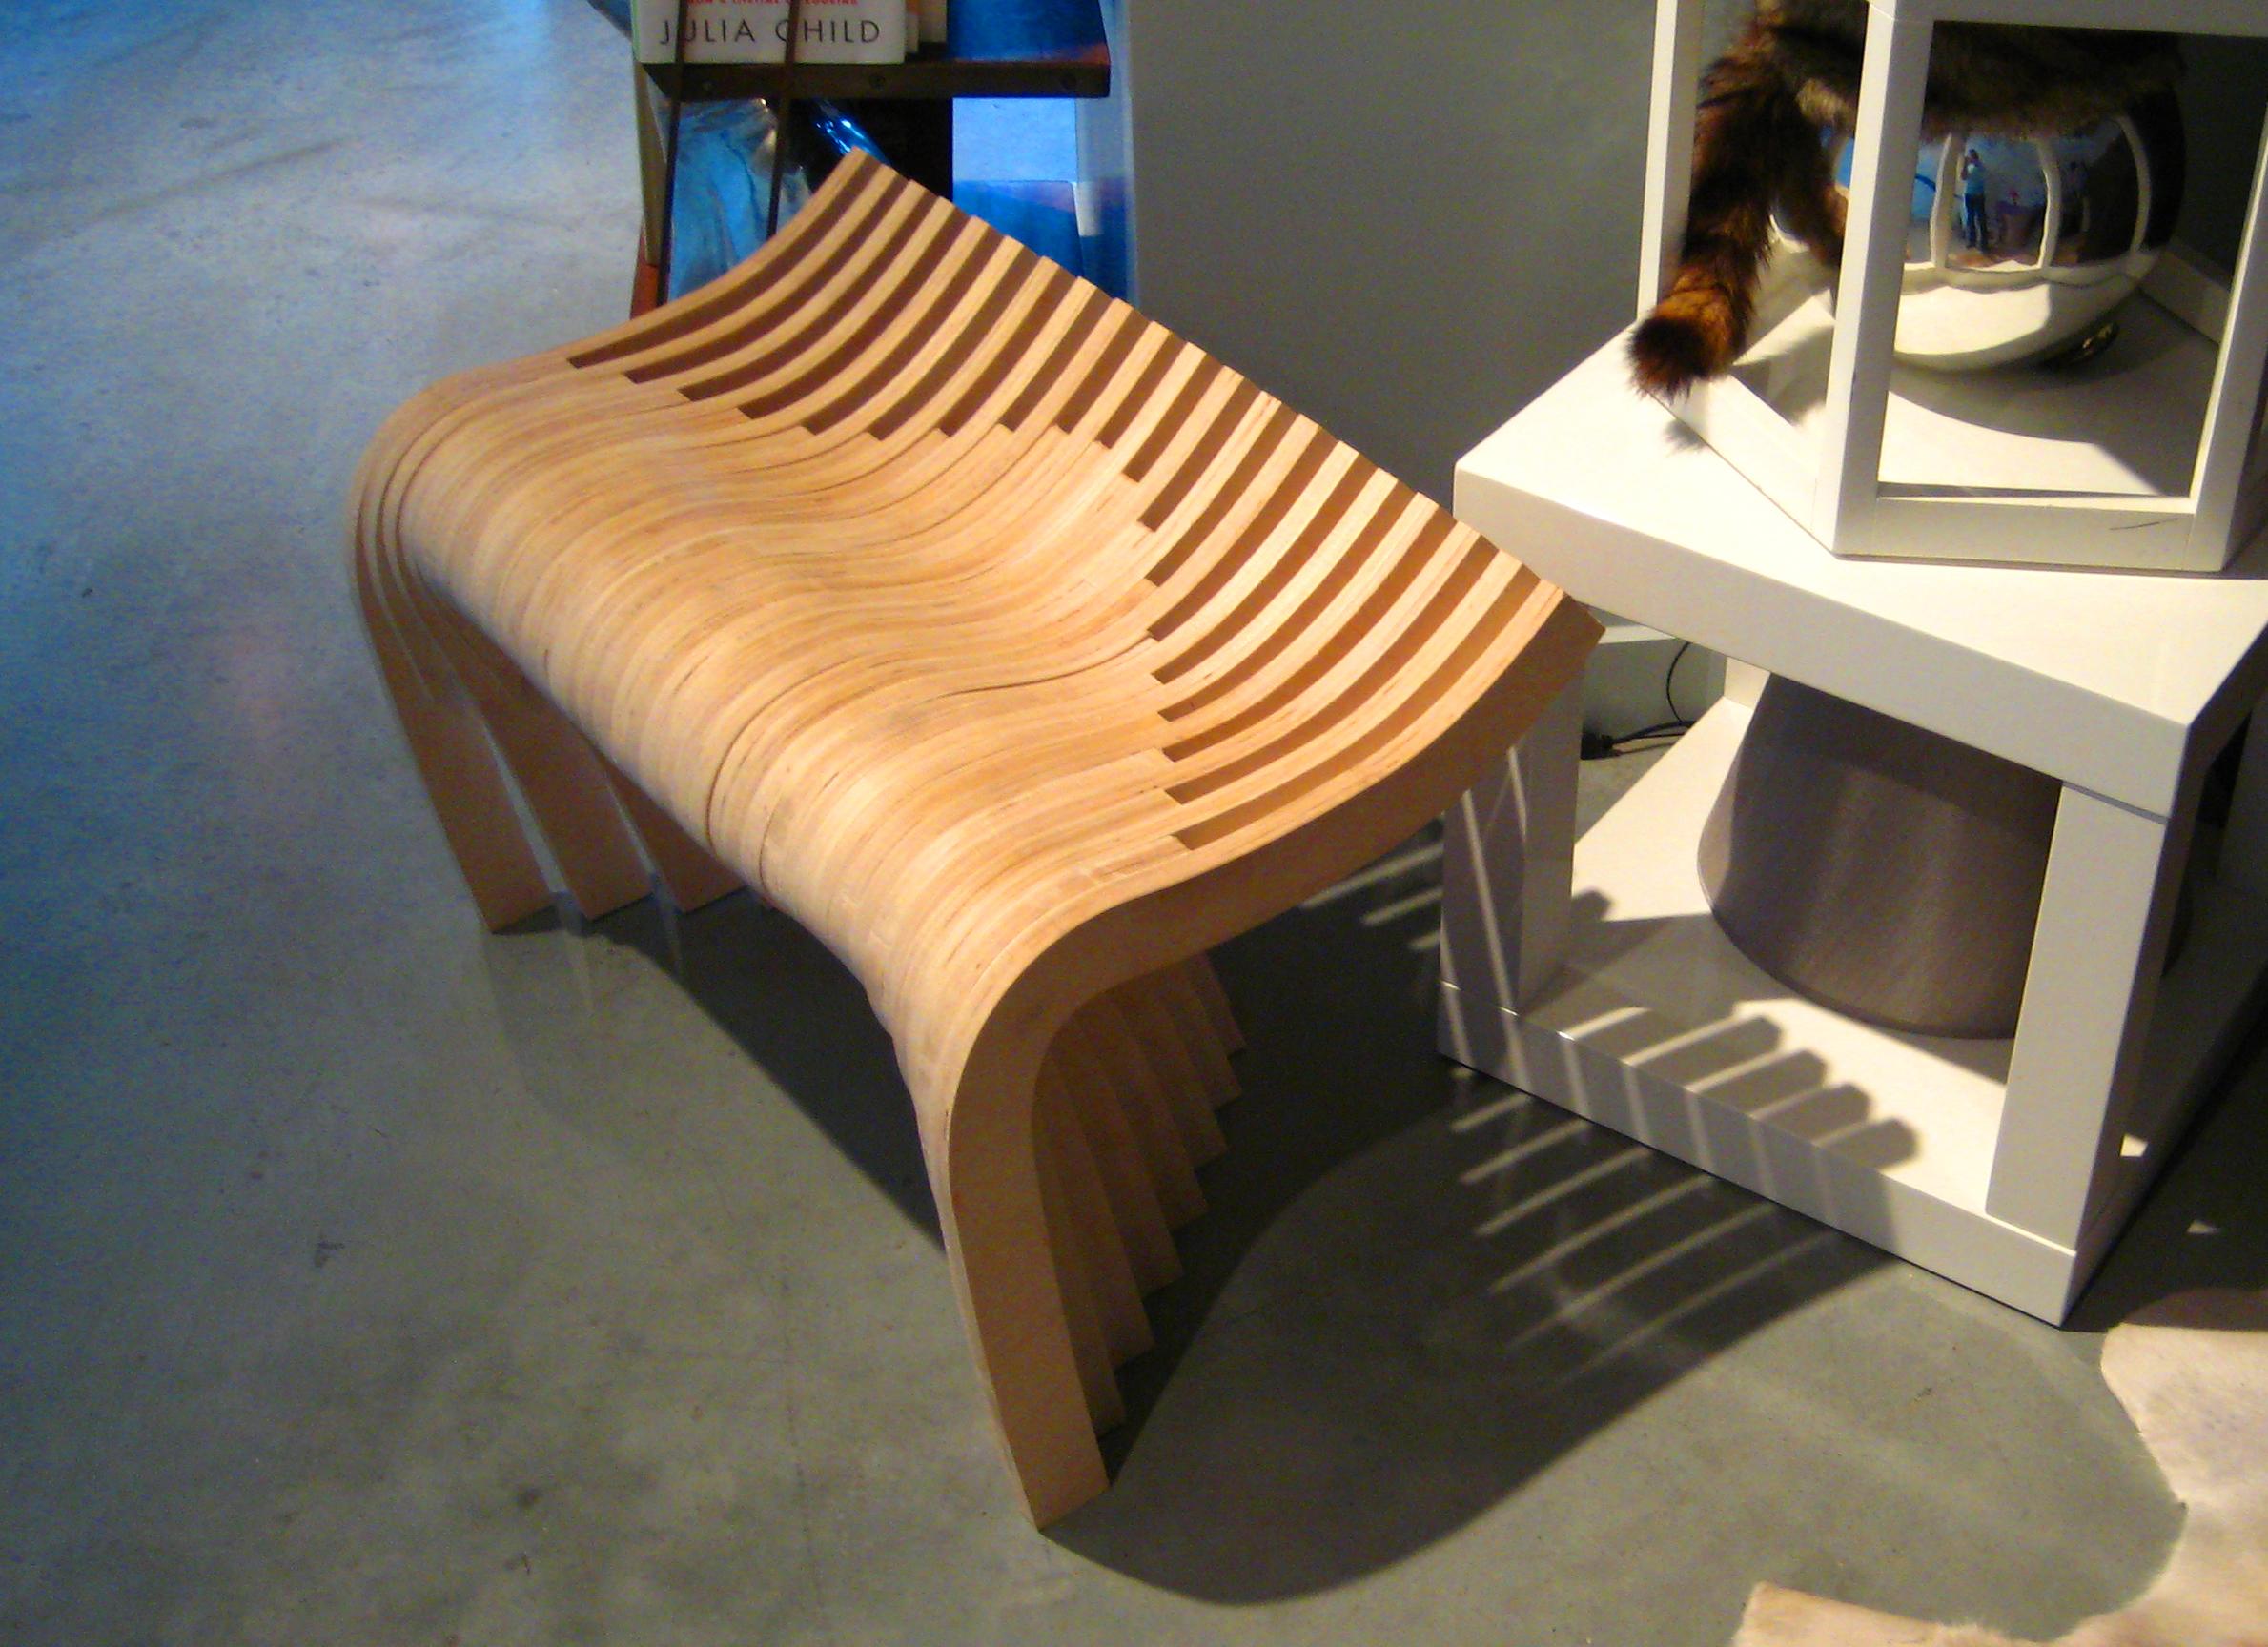 wood_contour_seat_004.jpg